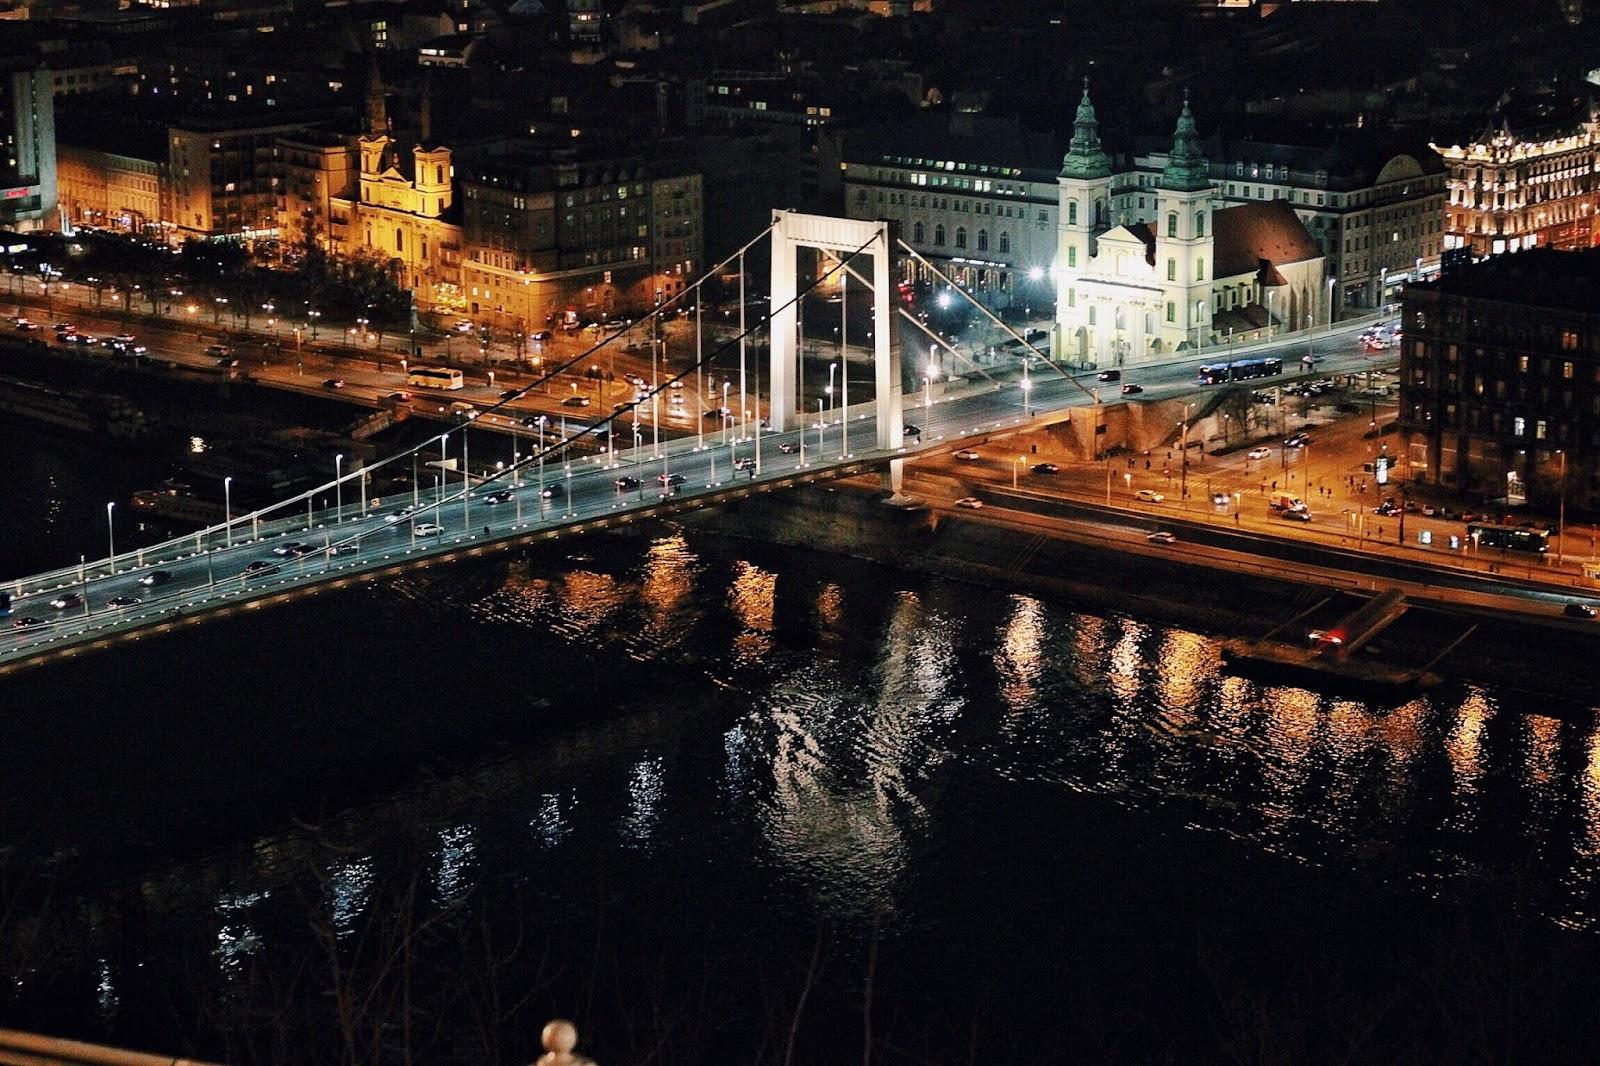 lifesthayle-budapest-citadella-elisabeth-bridge-at-night.jpg